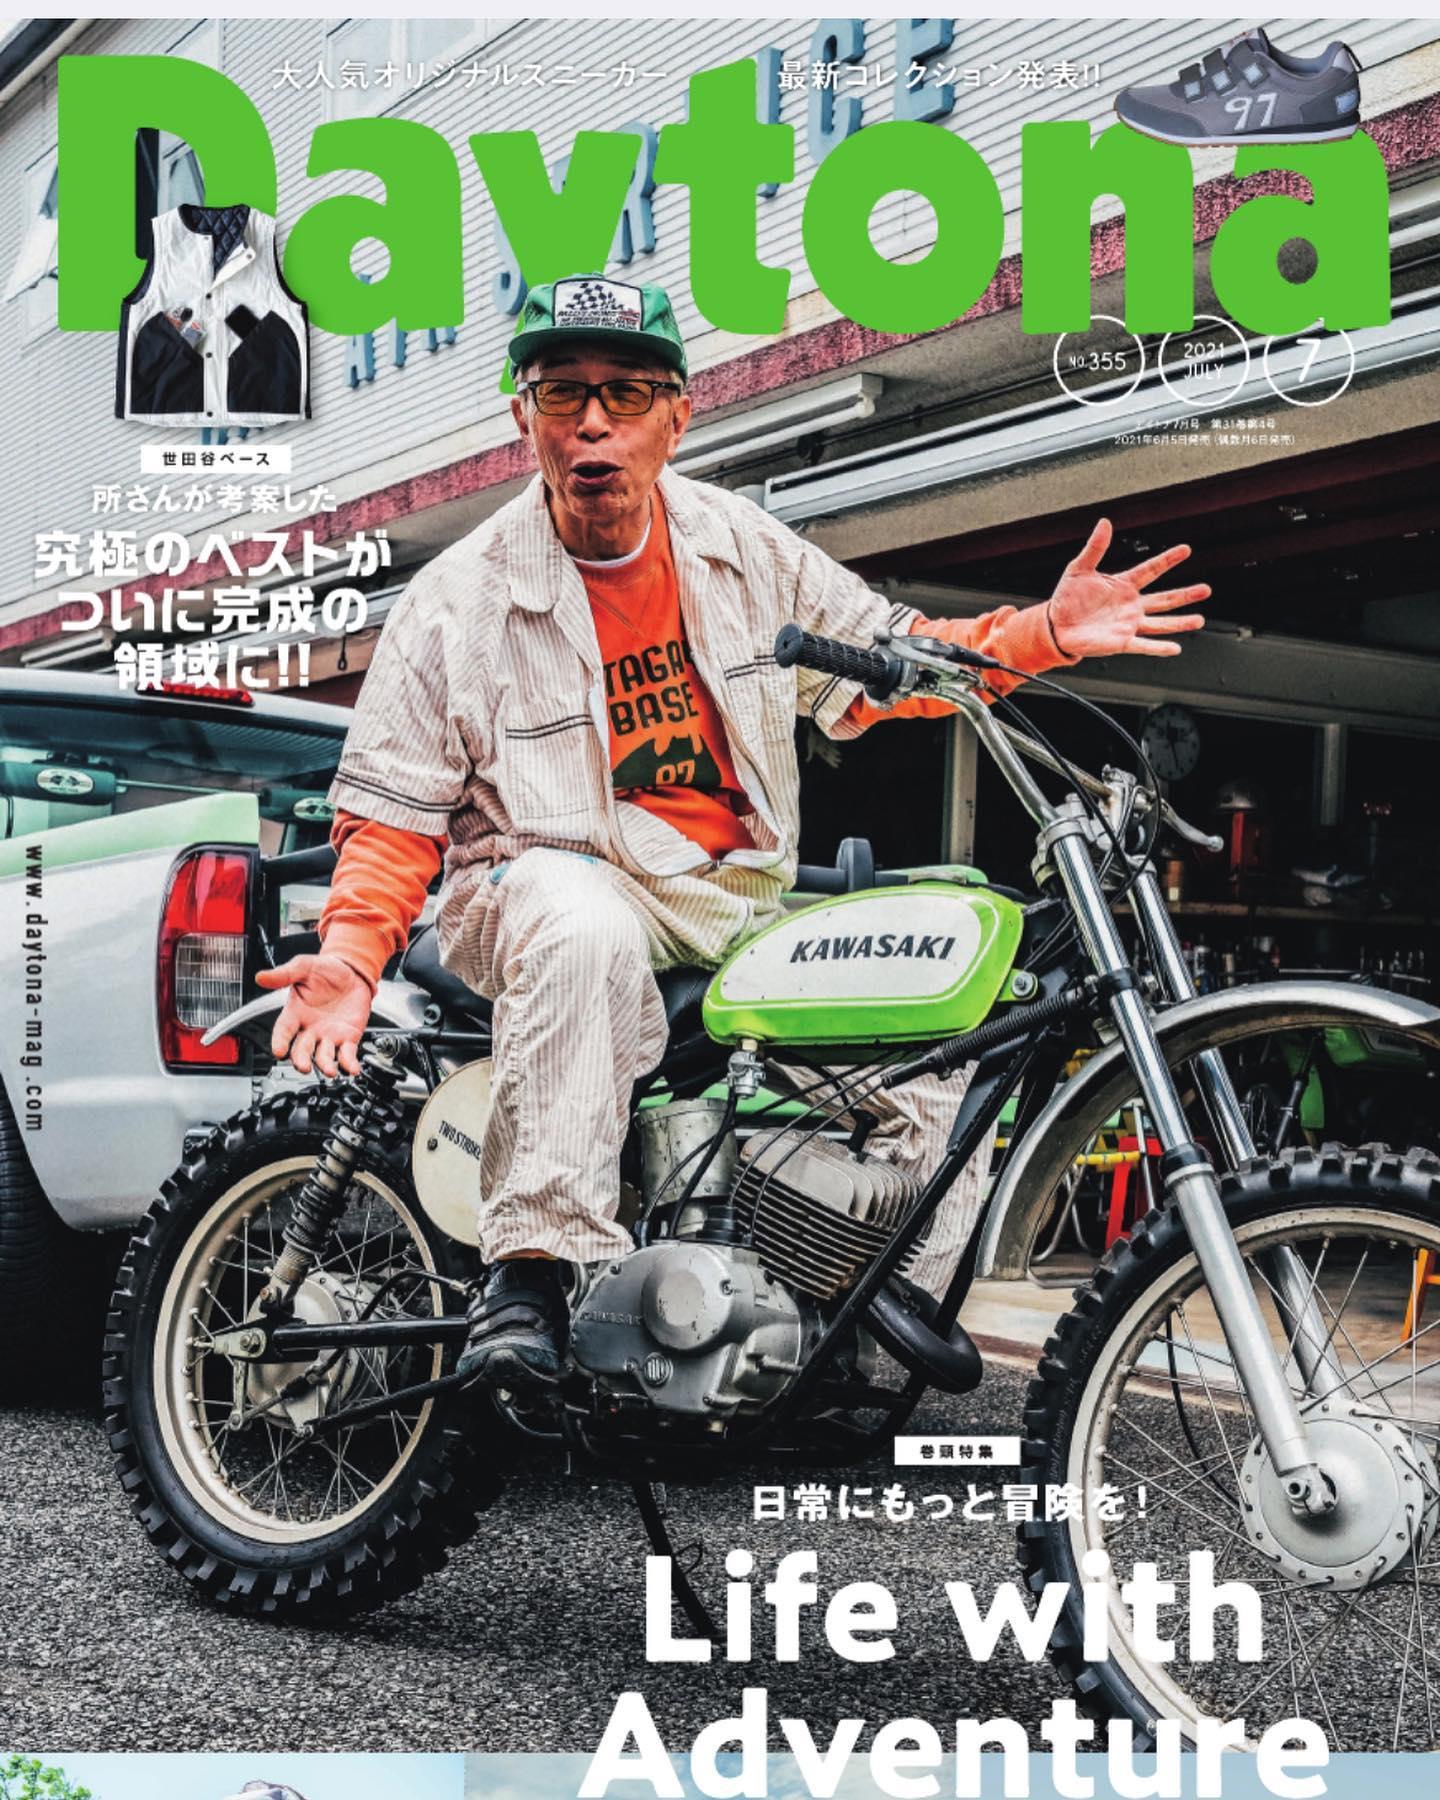 Daytona 7月号発売でございます️あとはガラスと…#daytona #daytonamagazine #mazda #ポーター #マツダ #鈑金塗装 #レストア #千葉 #千葉北 #dmc